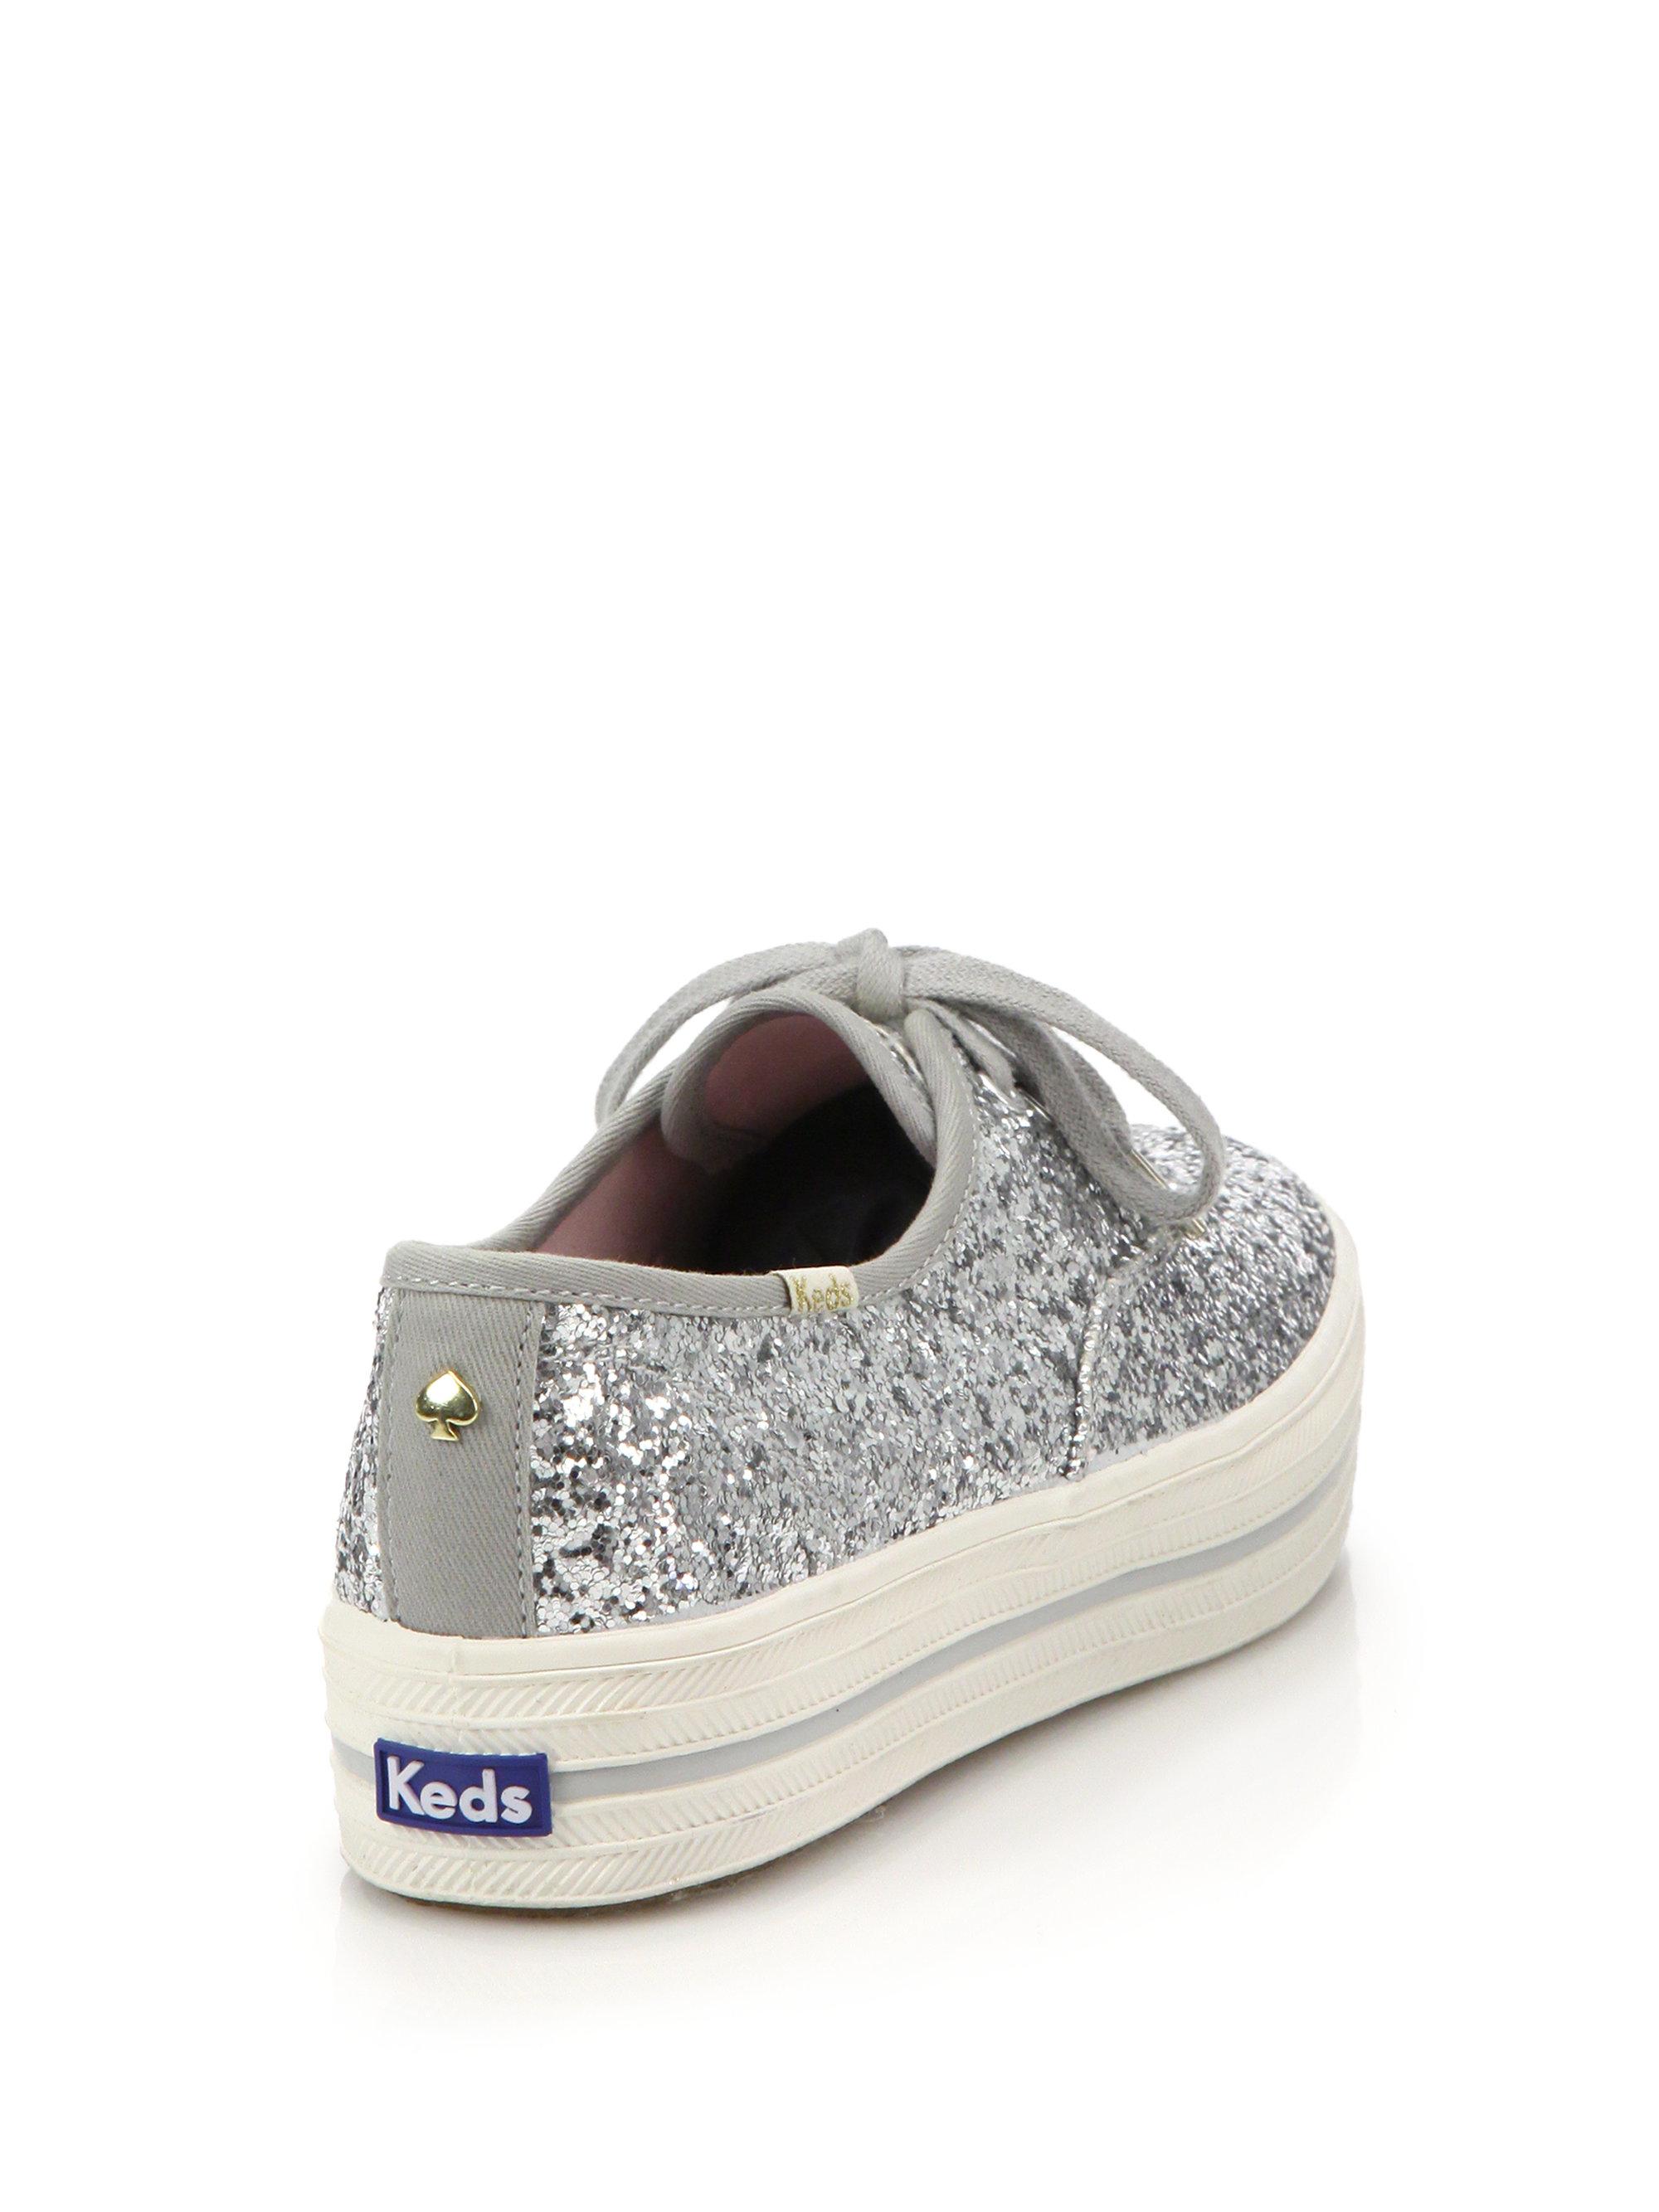 03976d4fb74bb Lyst - Kate Spade Keds For Triple-kick Glitter Platform Sneakers in ...